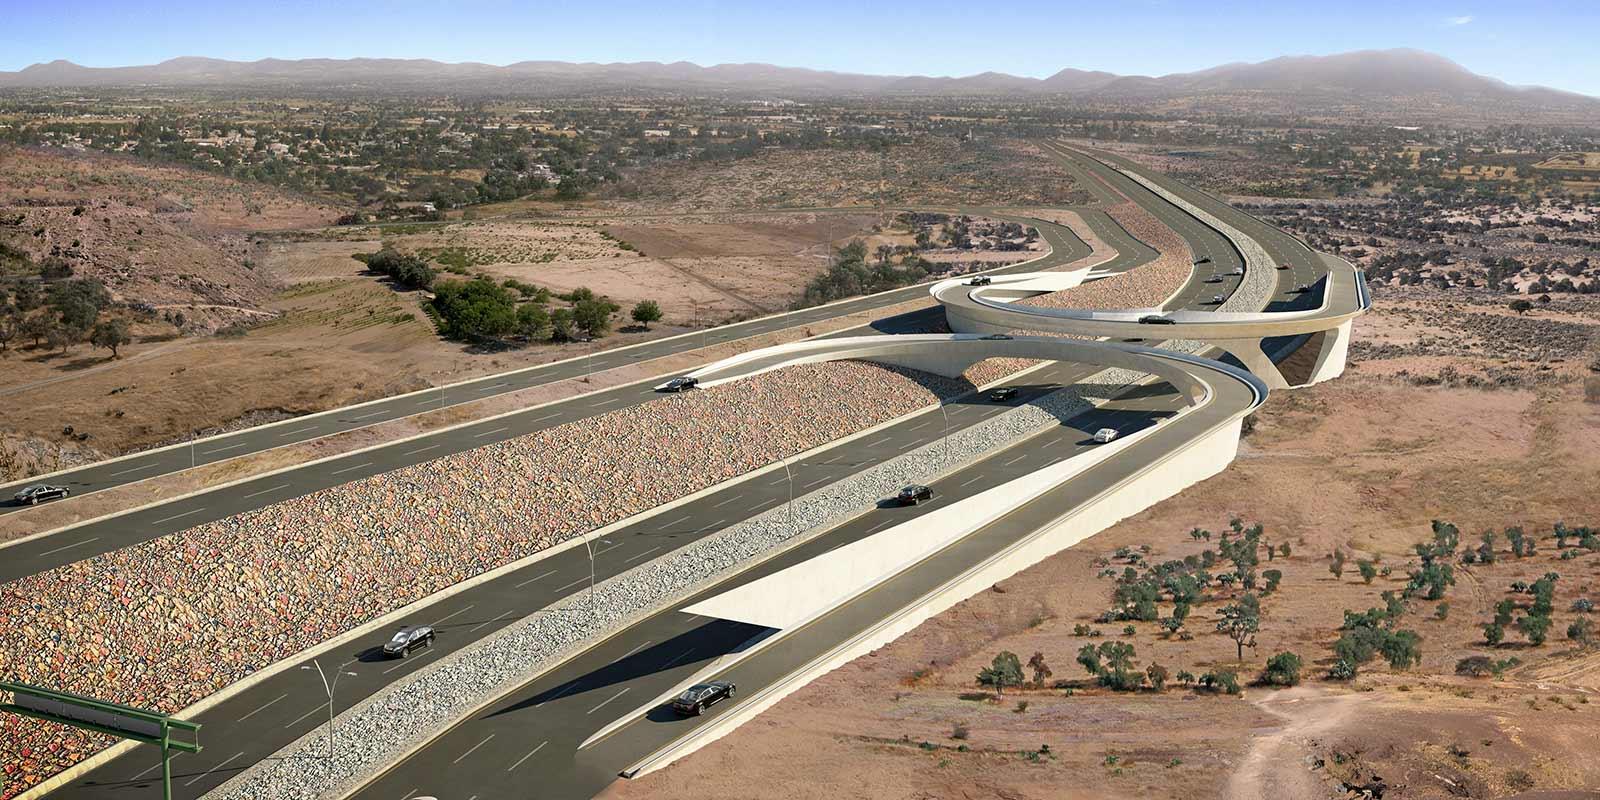 Zacatecas Highway Bridge Urban Planning, 2010